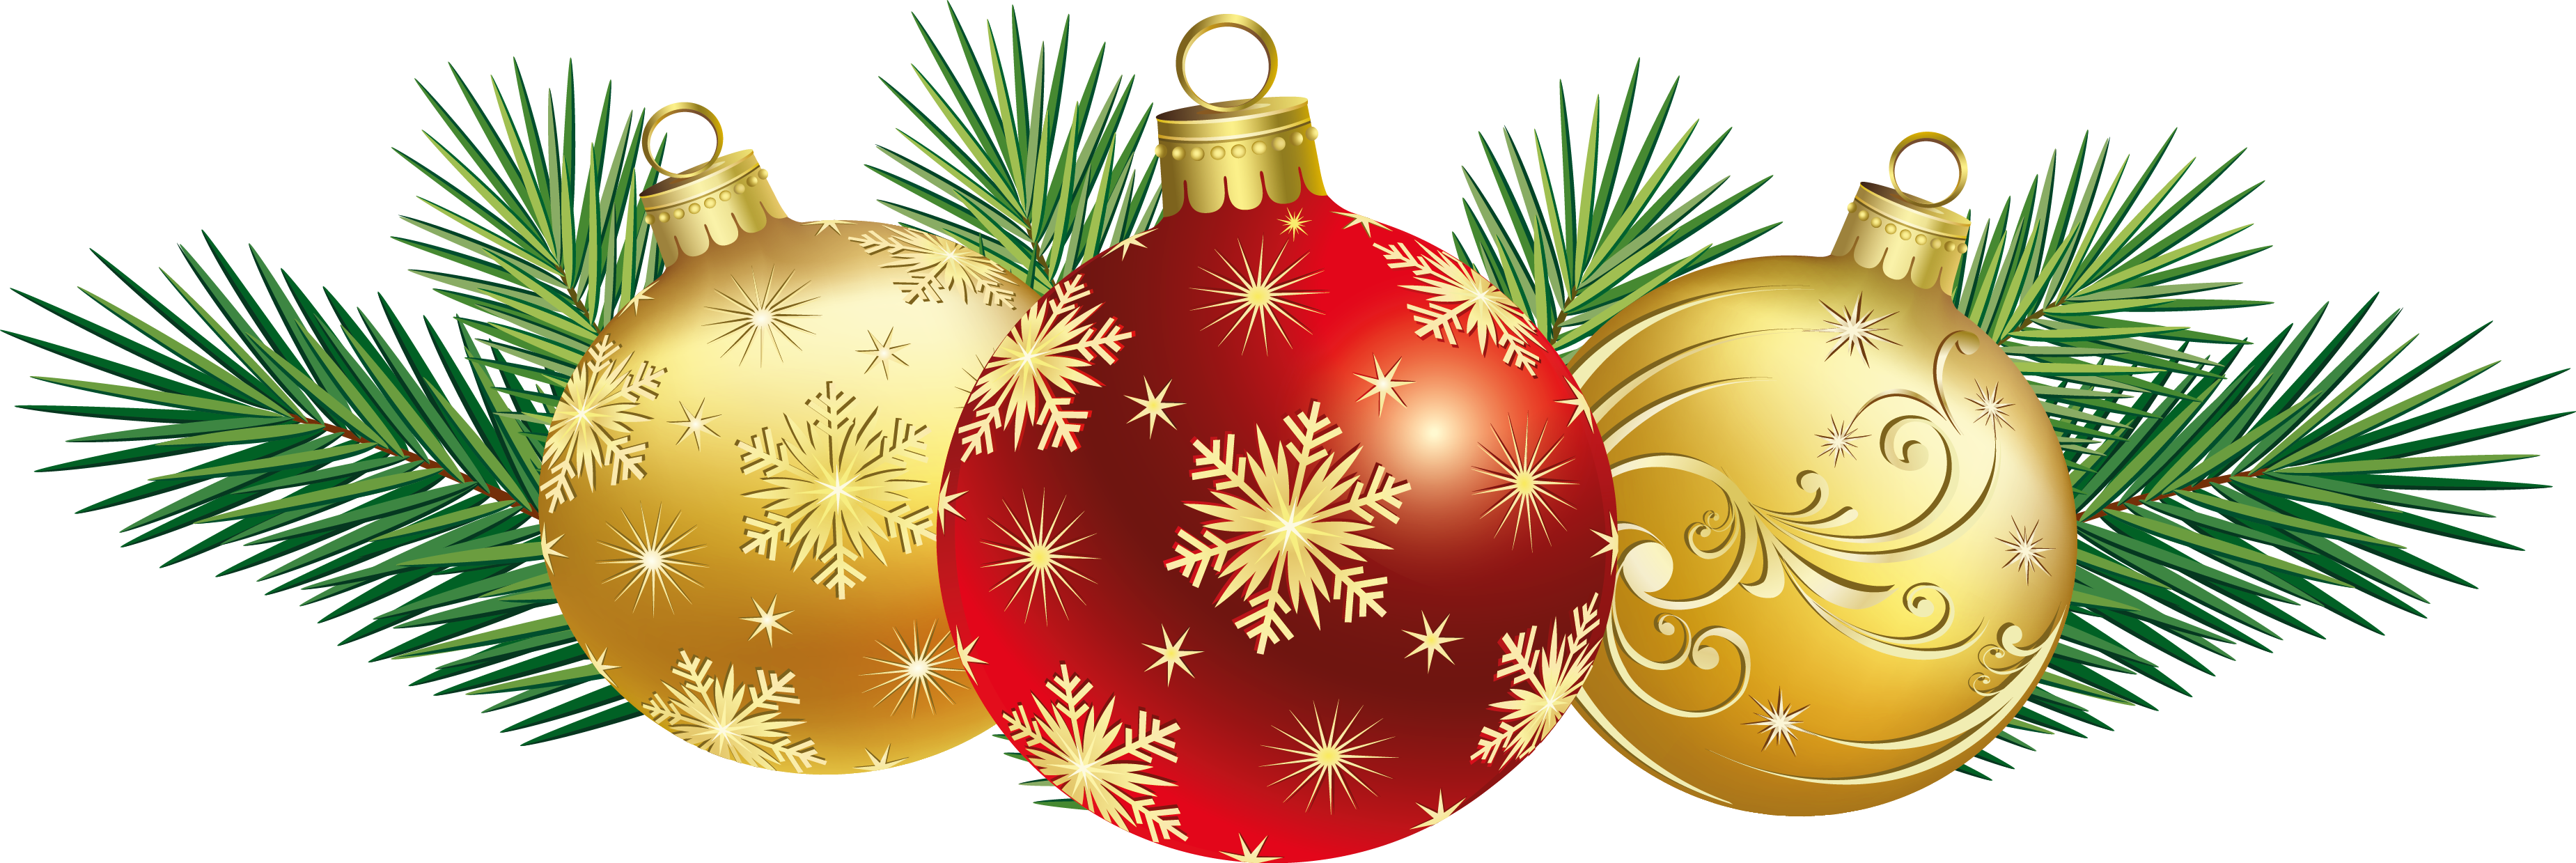 Christmas balls decoration png. Ham clipart xmas